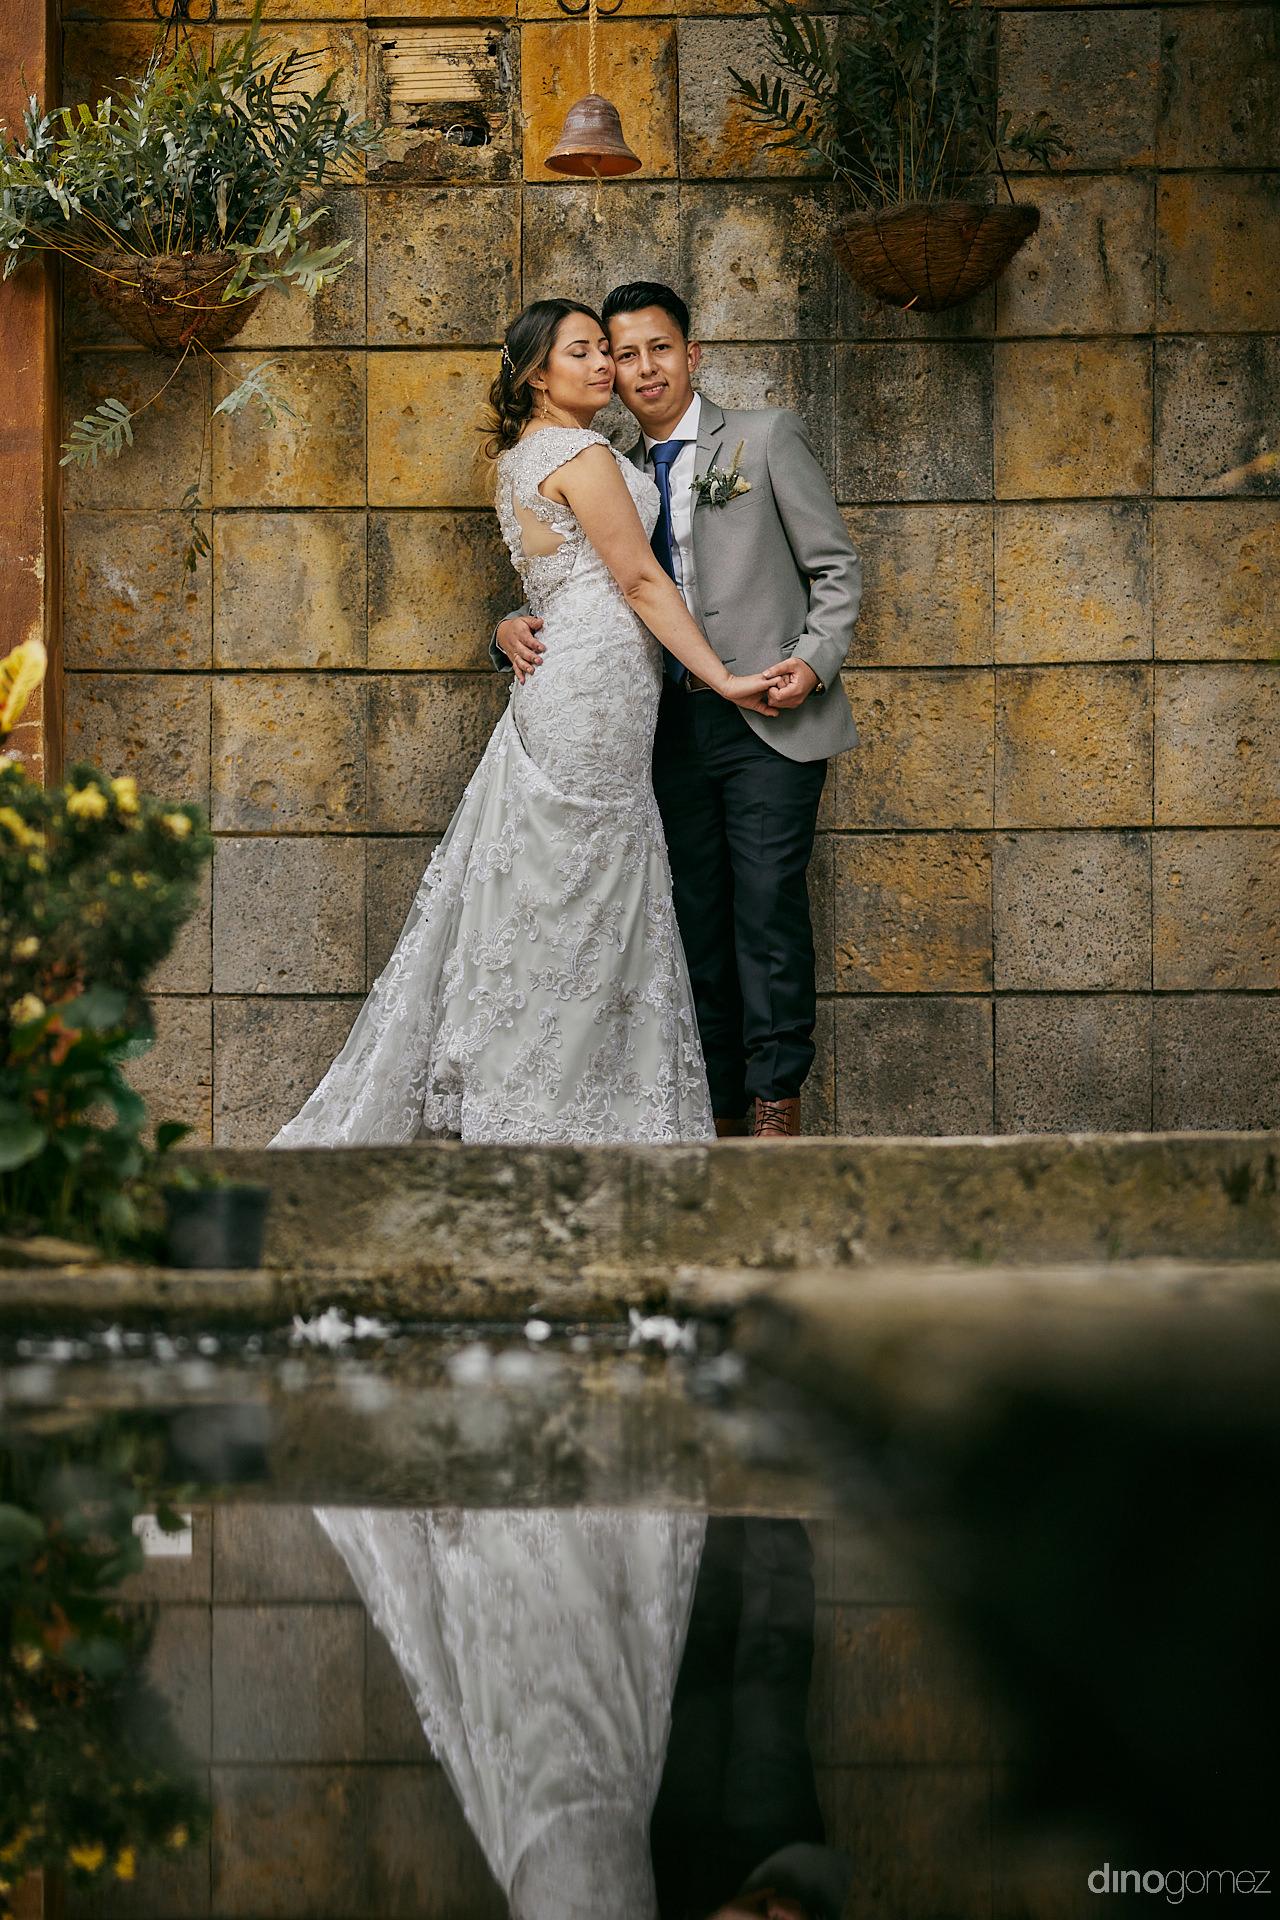 023 - Diy Budget Destination Weddings Can Be Prety Too!